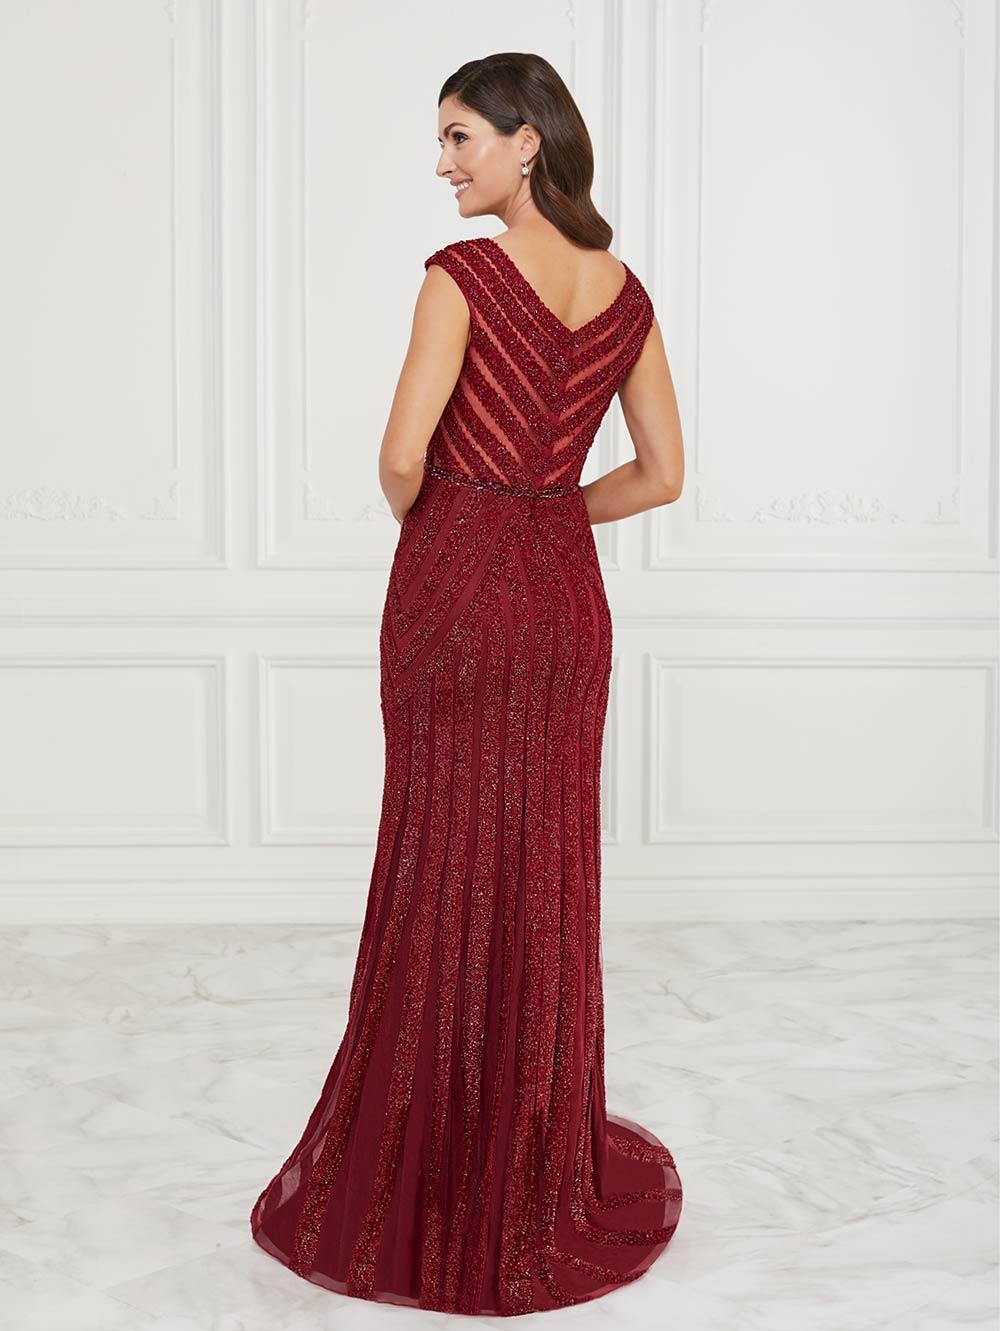 special-occasion-dresses-jacquelin-bridals-canada-27698